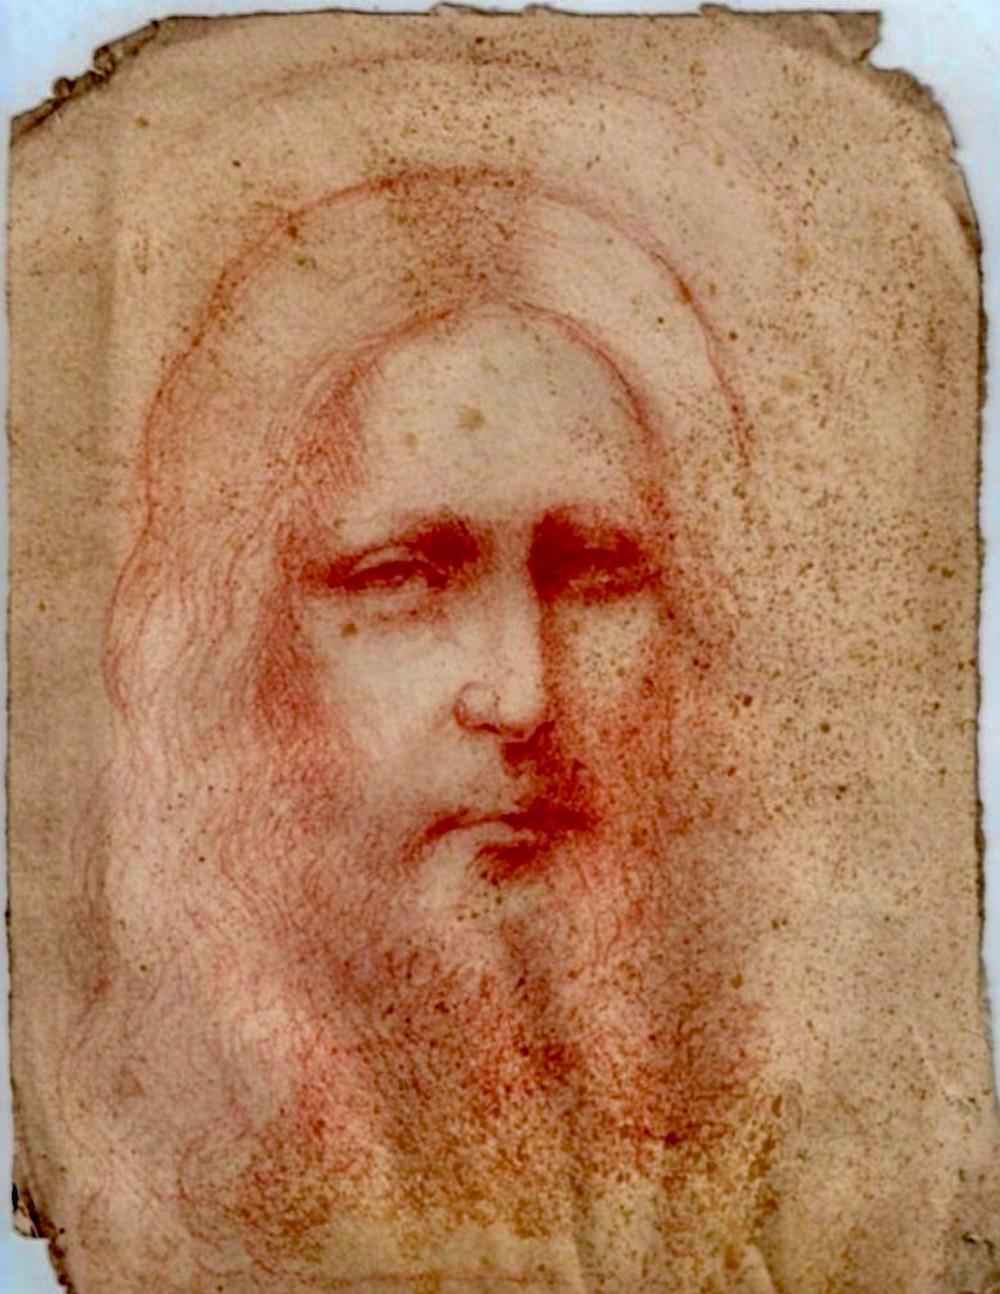 newly found sketch of Jesus Christ attributed to Leonardo